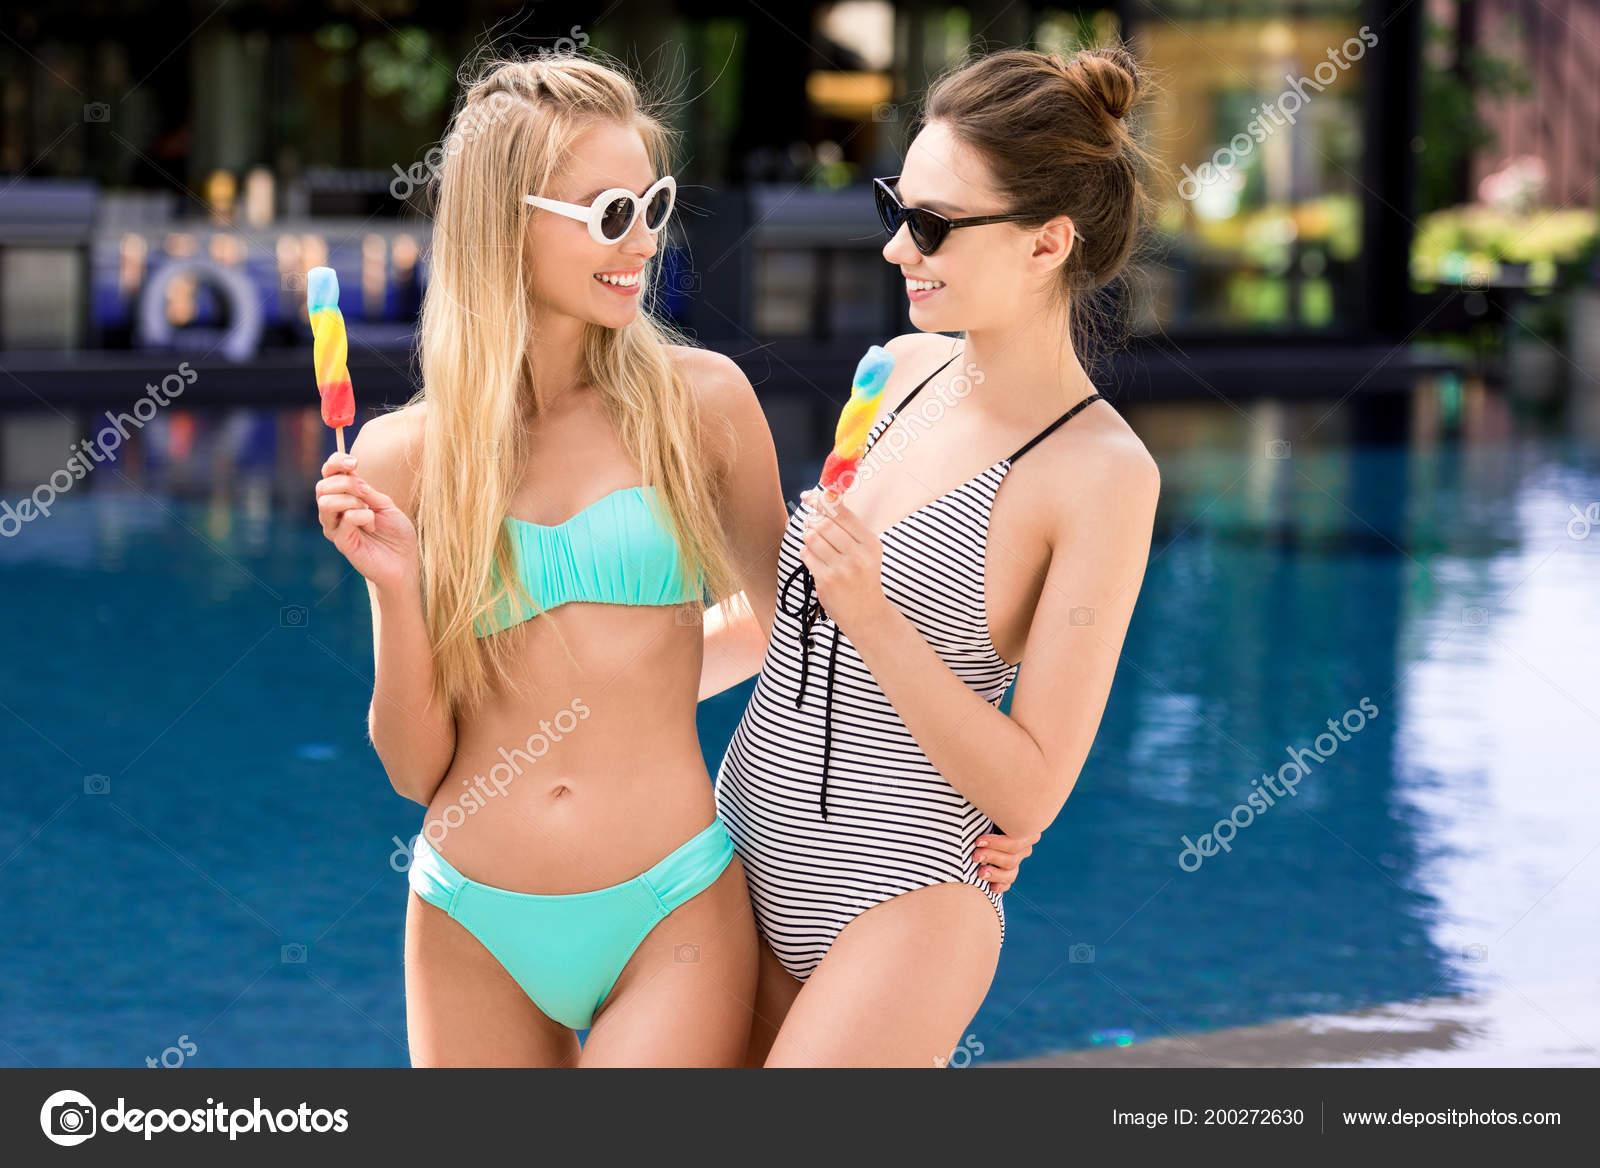 Badpak Bikini.Gelukkig Jonge Vrouwen Badpak Bikini Met Ijslollys Bij Zwembad